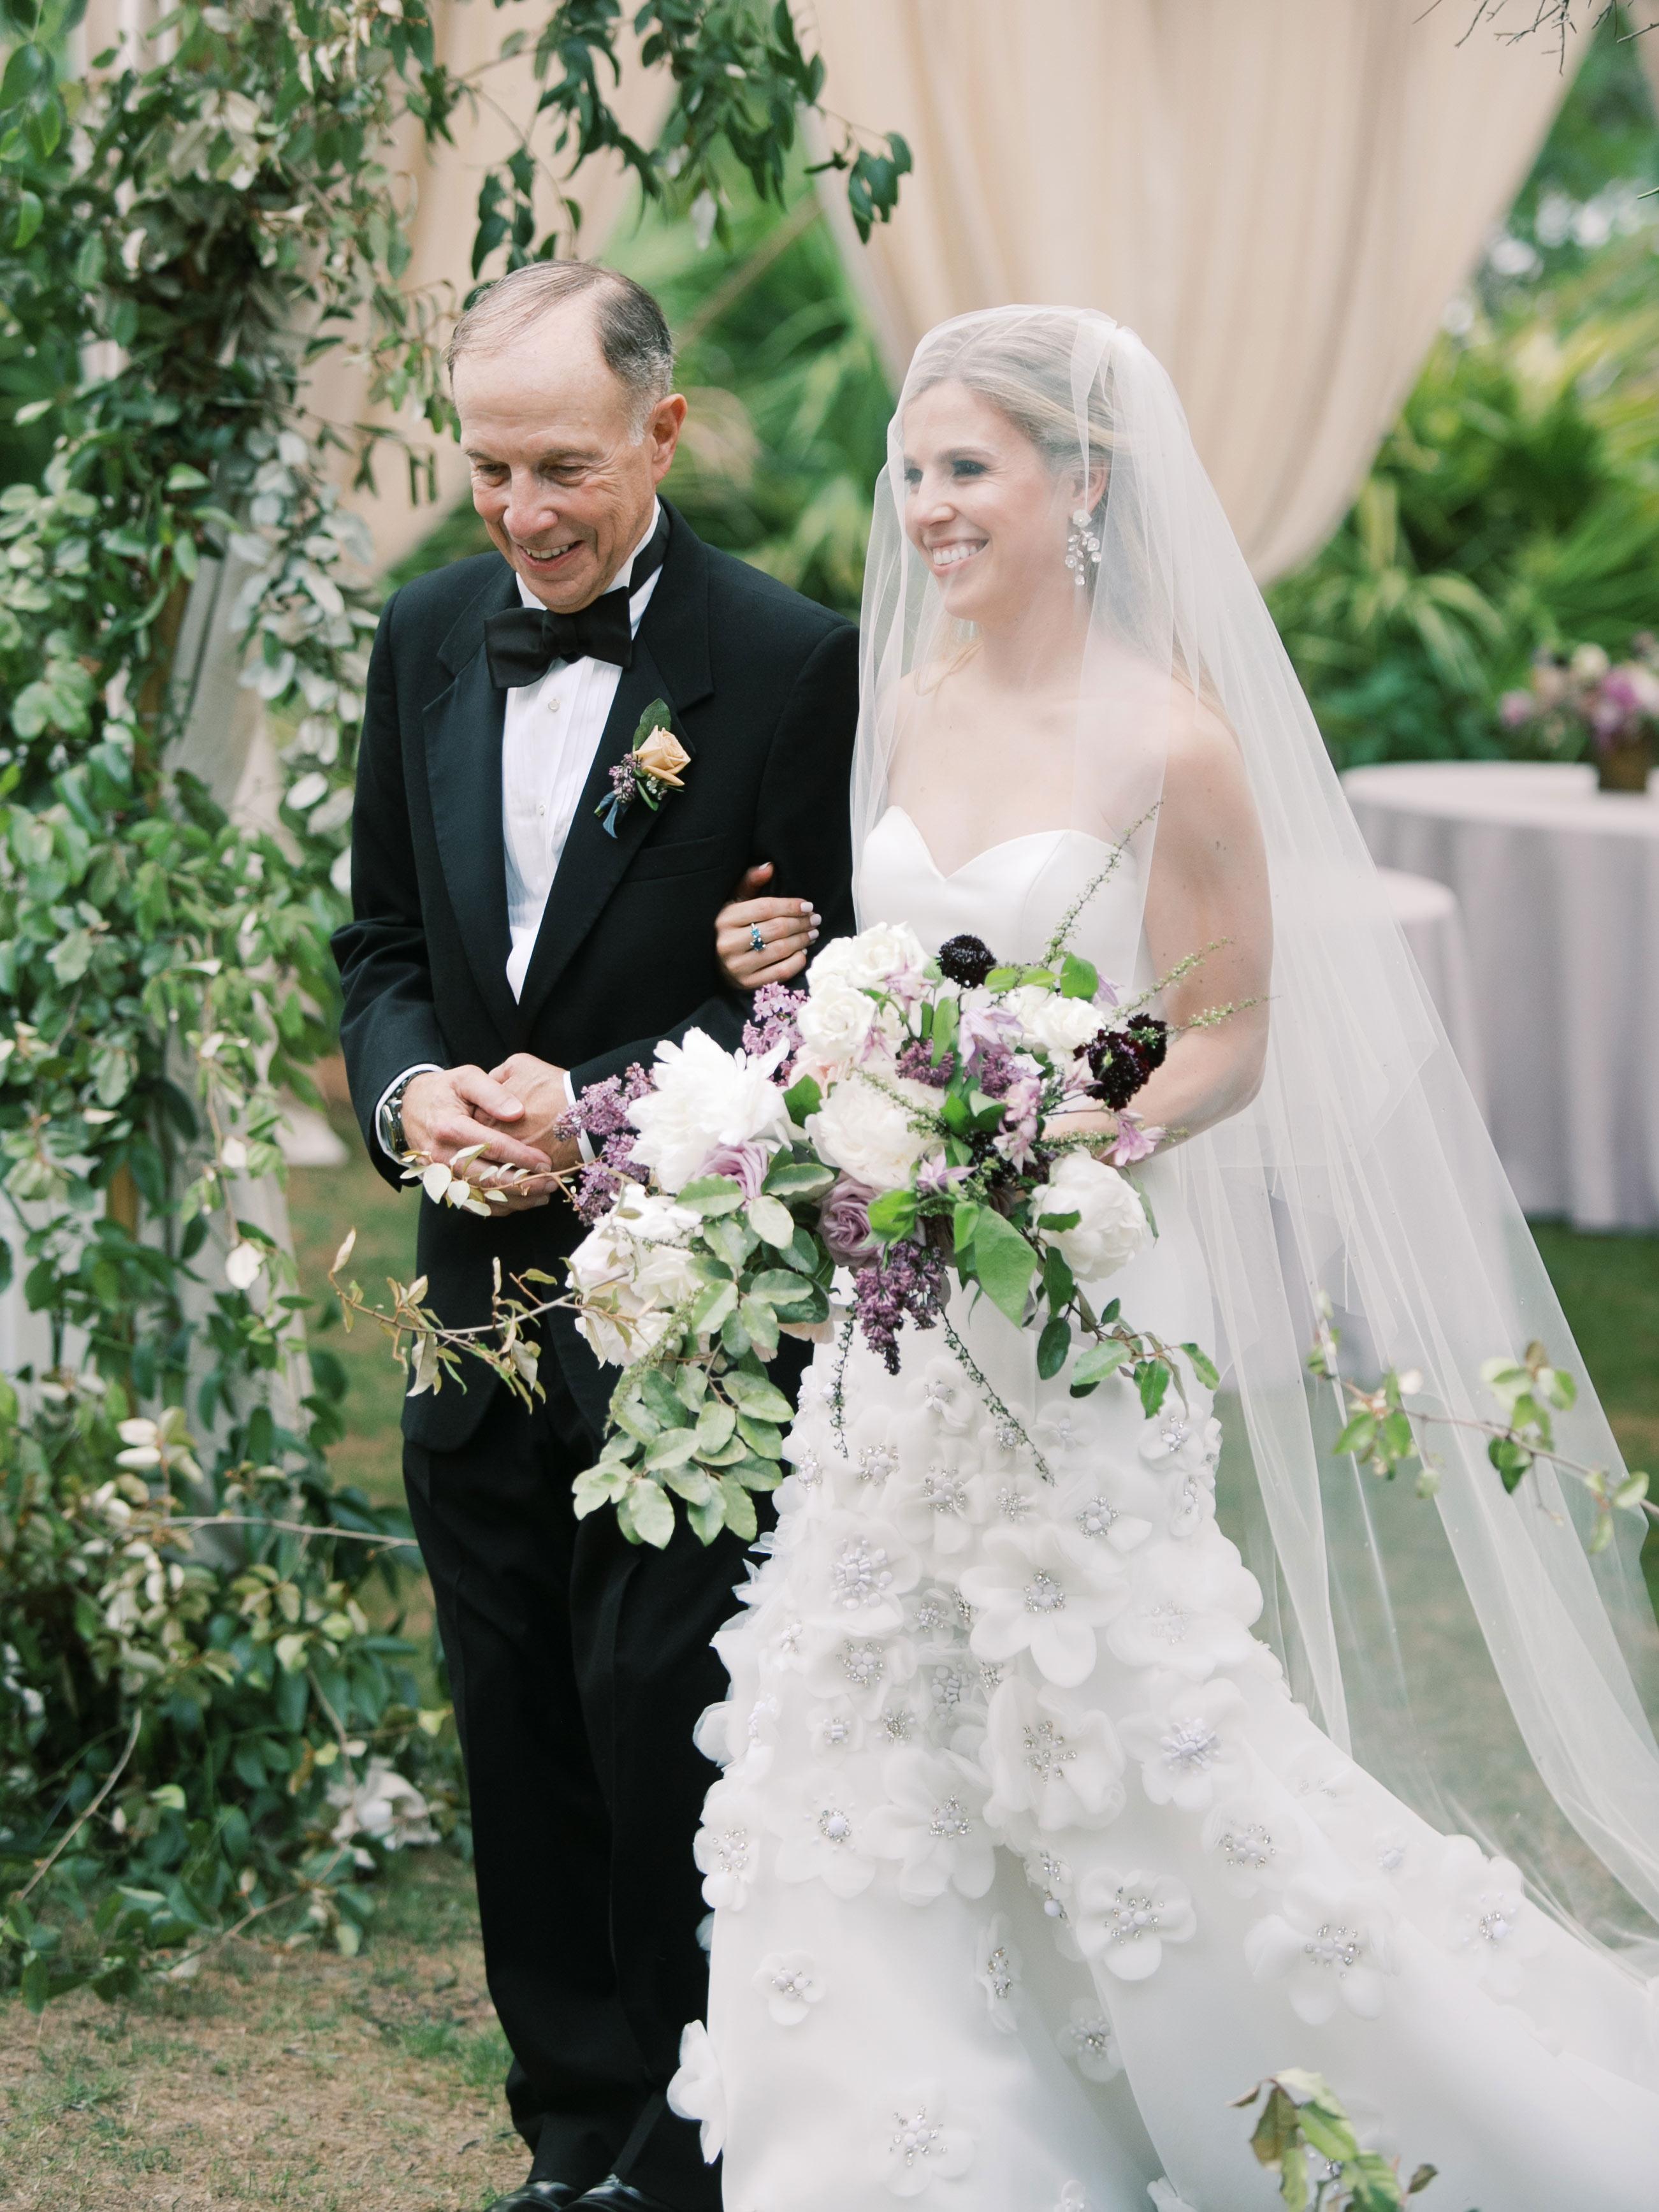 leighton craig wedding bride walking with dad